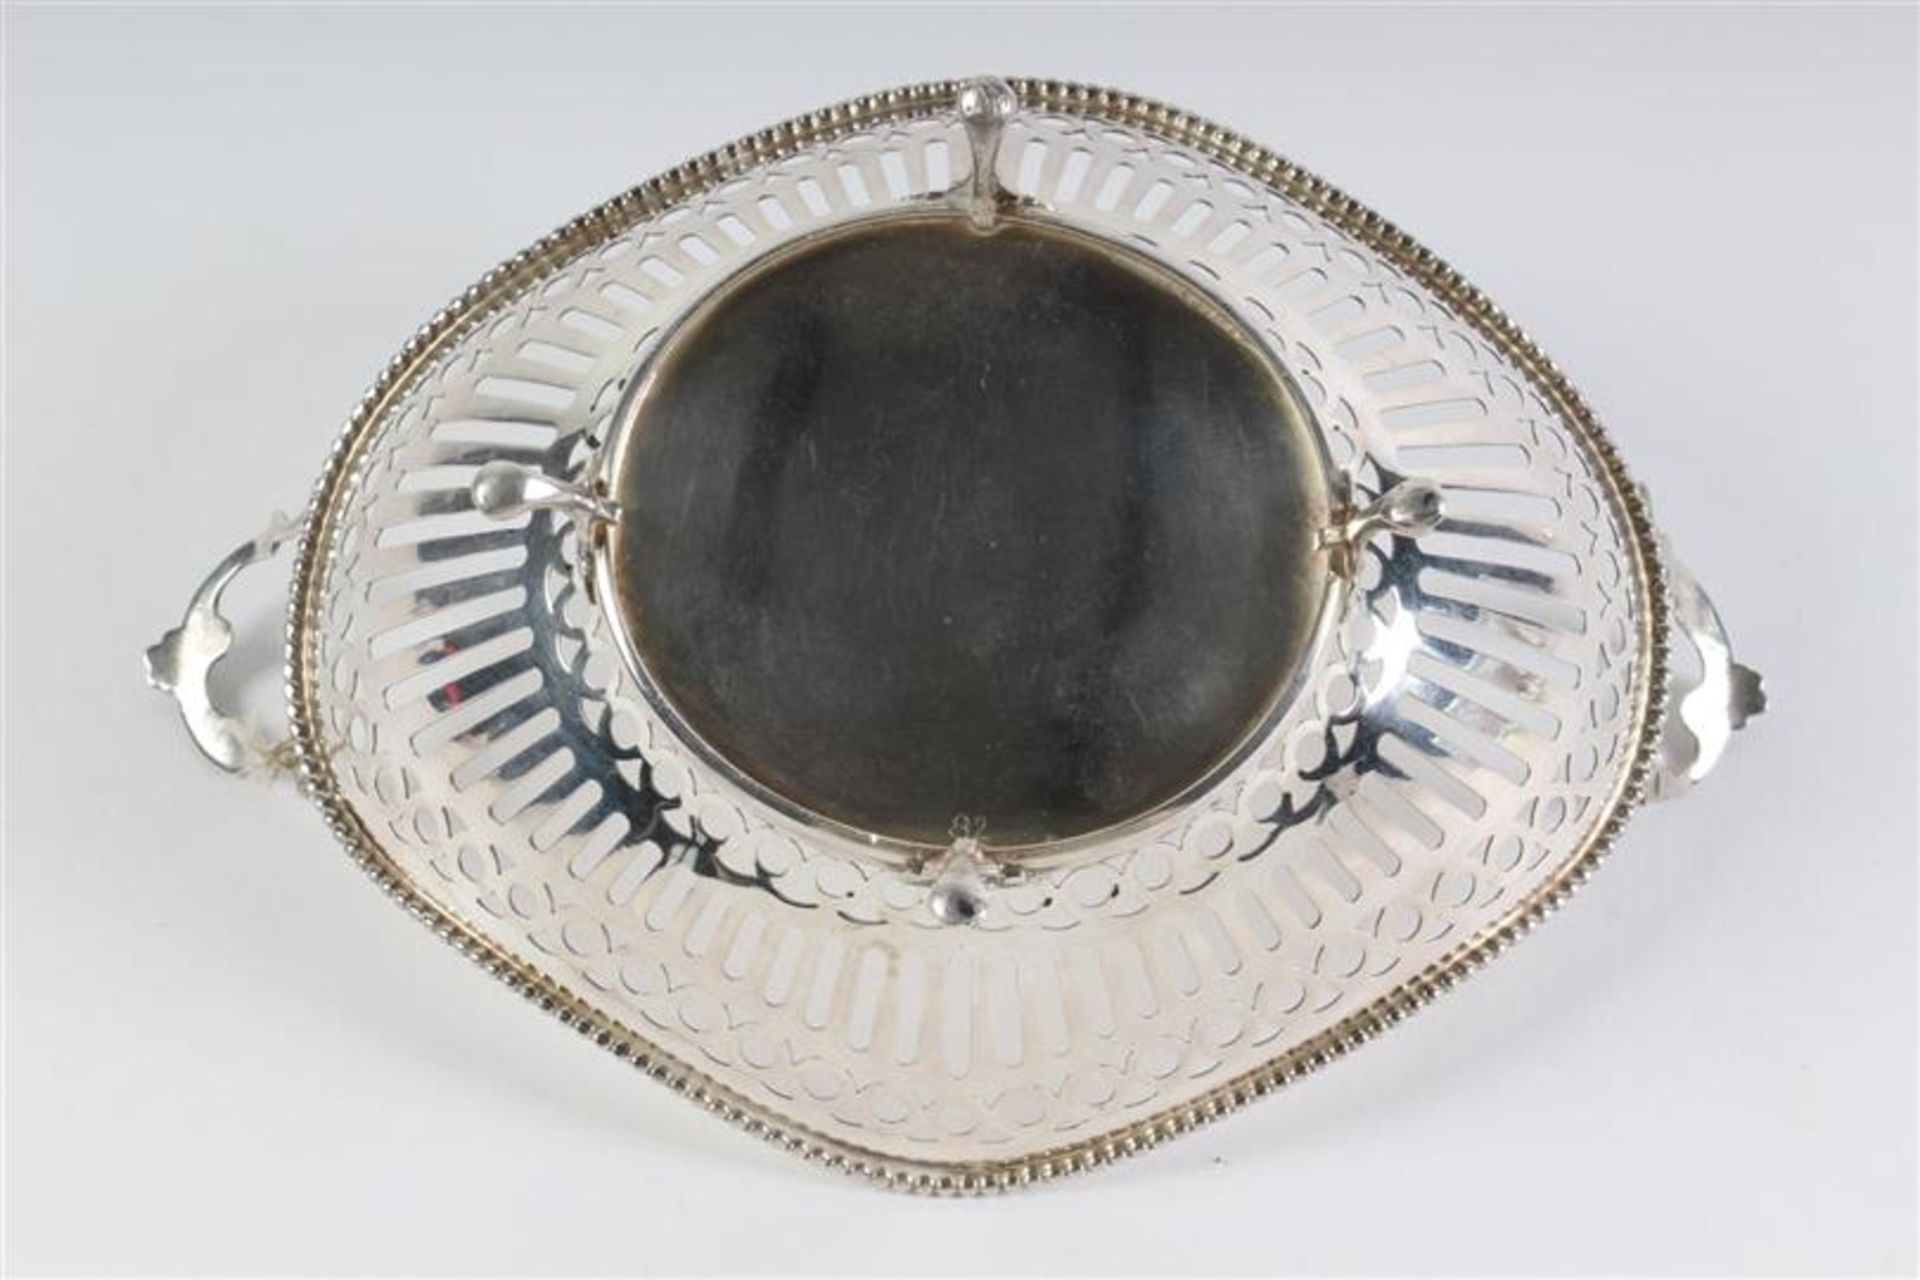 Zilveren bonbonmandje met parelrand, Holland, 20e eeuw. L: 16 cm. Gewicht: 82 g. - Bild 2 aus 4